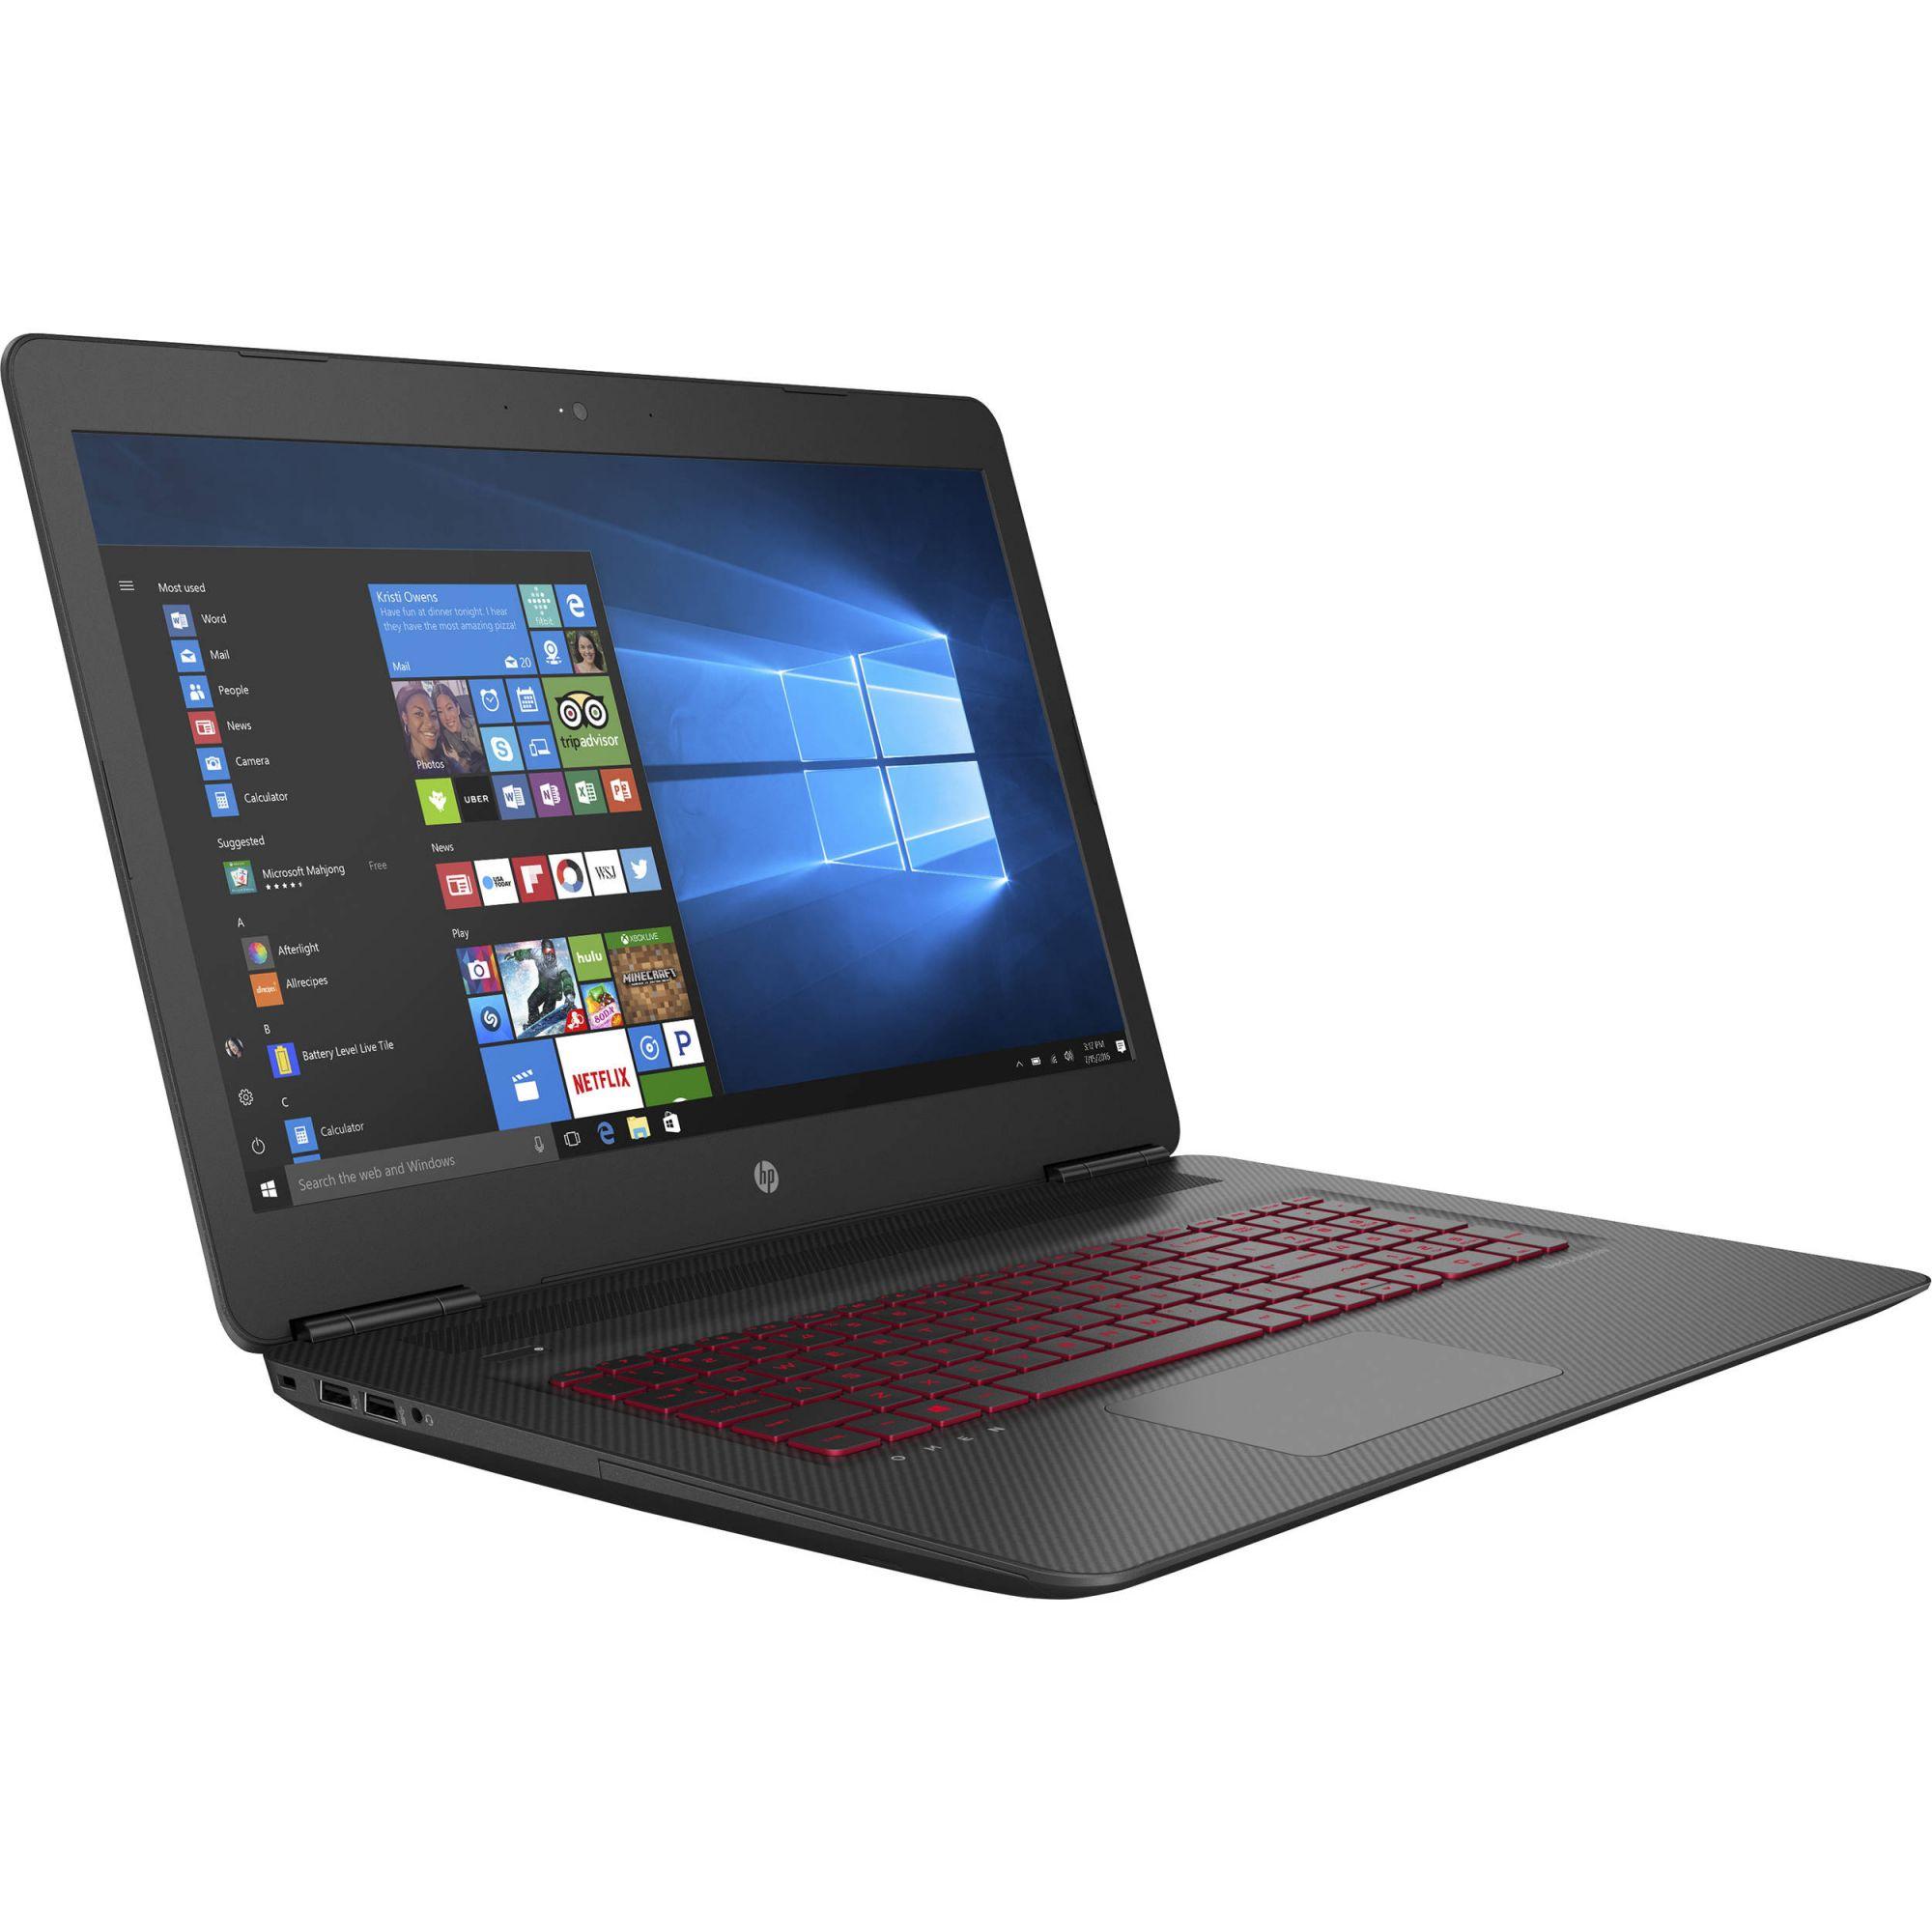 "Notebook HP Gaming Omen 17-W210NR I7-7700HQ 2.8GHz, DDR4 8GB, 1TB+ 128 SSD M.2, 17.3"" Full HD, GTX 1050 TI"